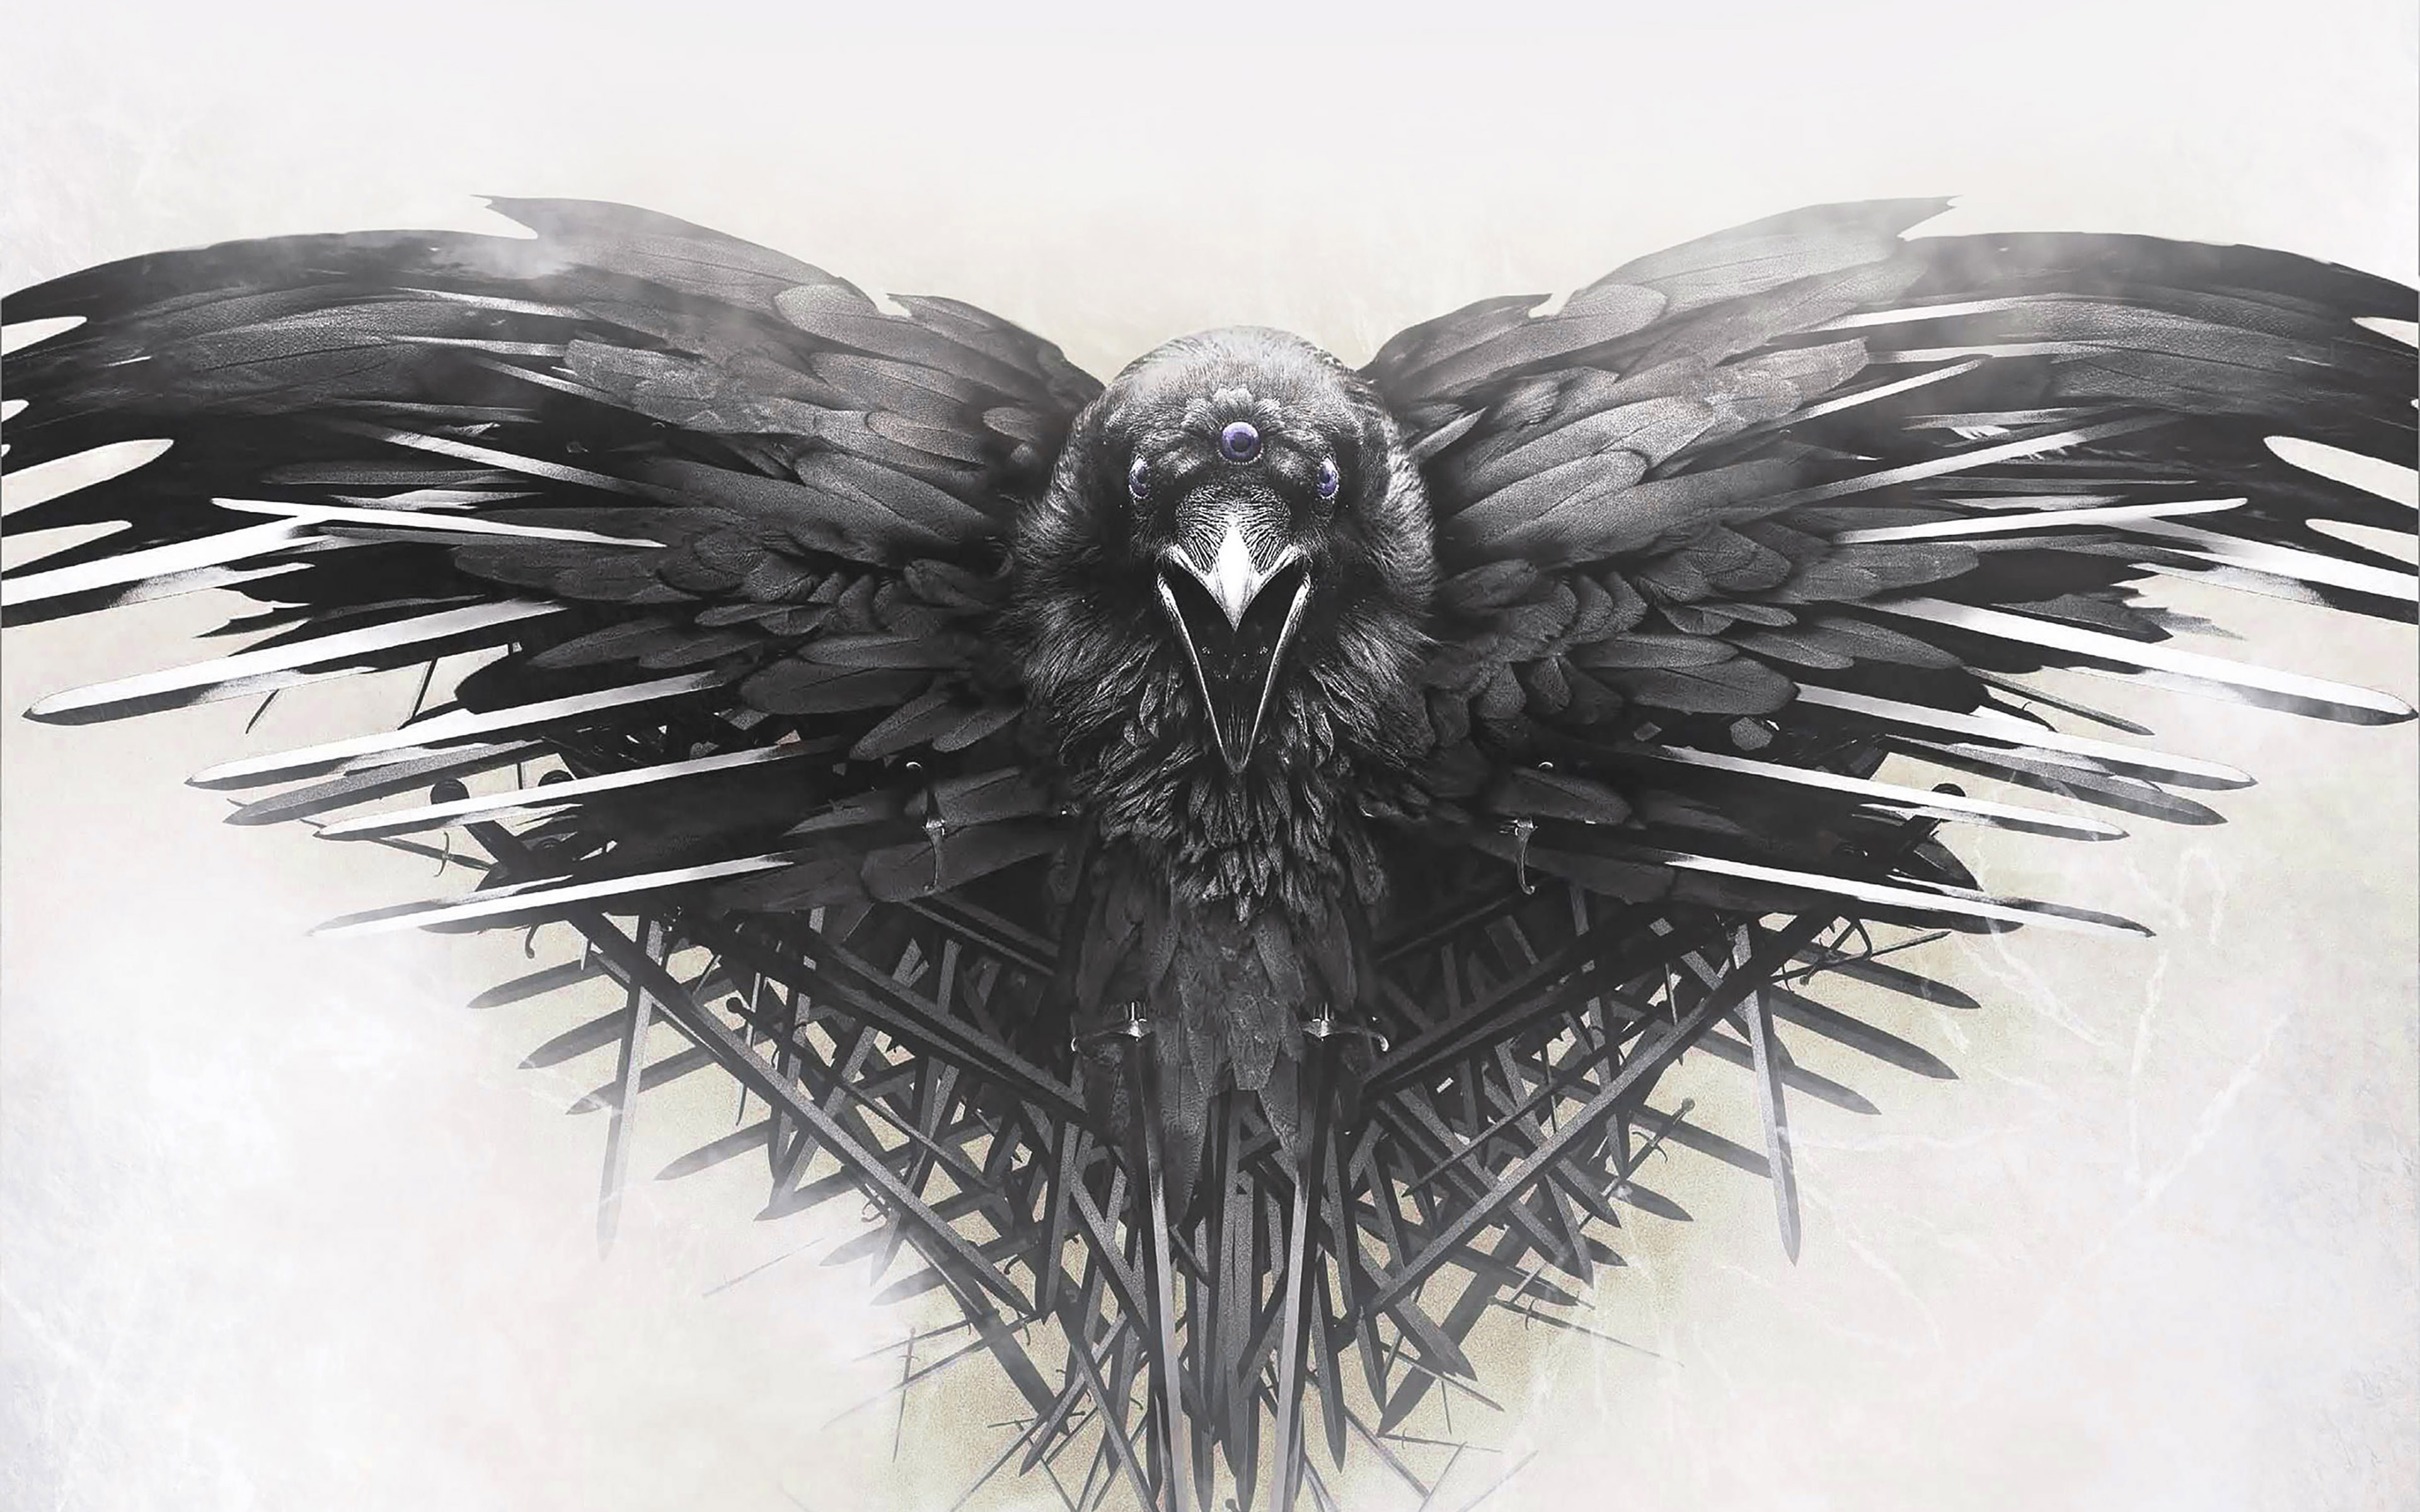 game of thrones wallpaper macbook air